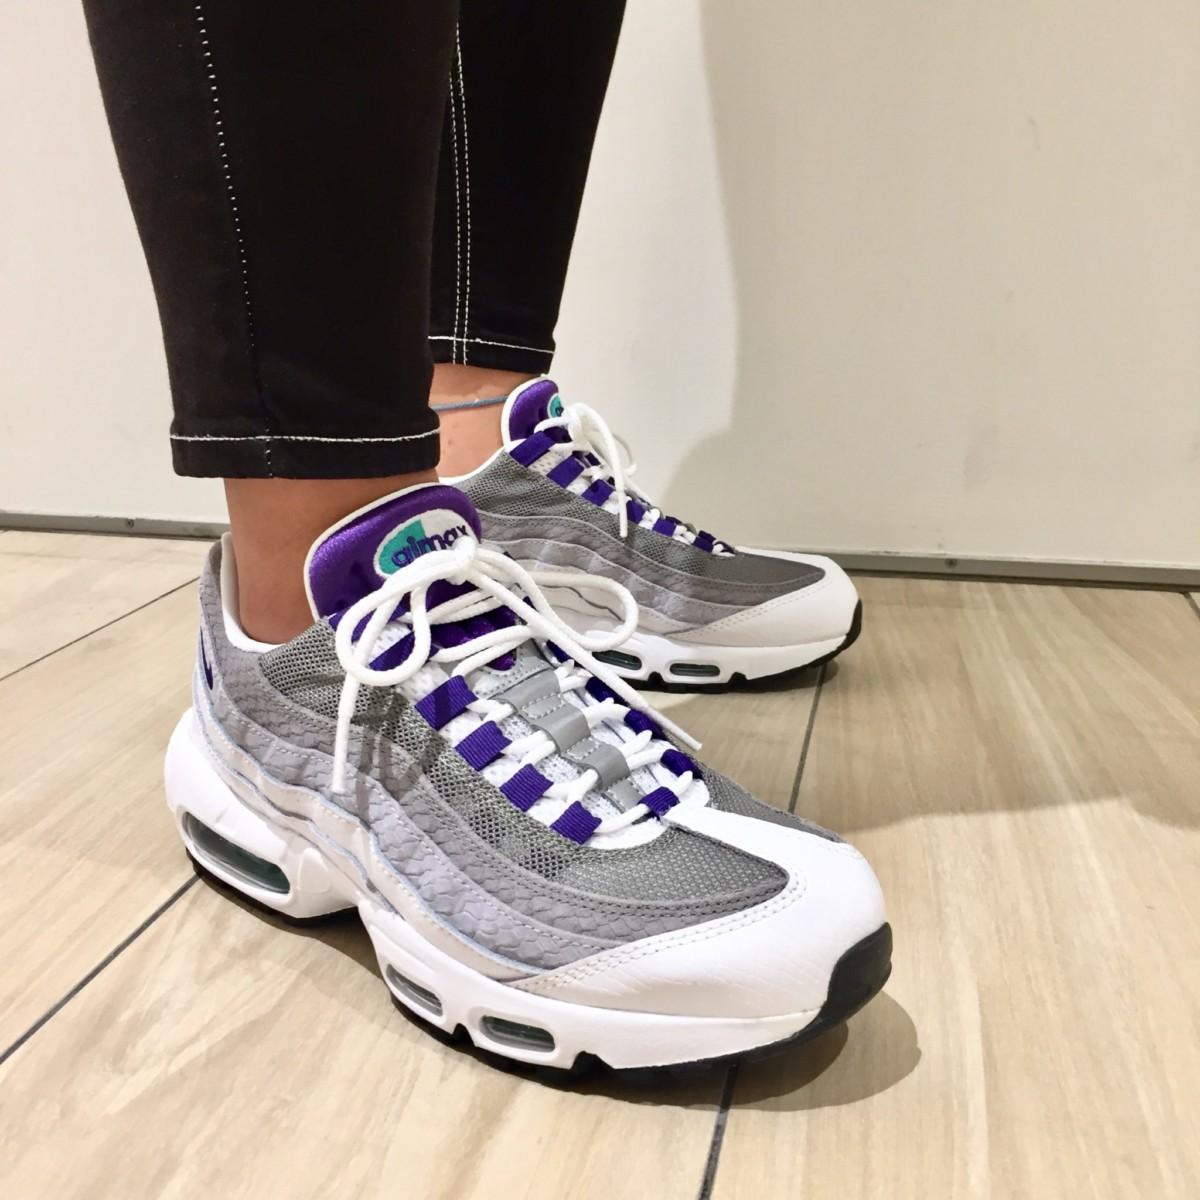 f:id:sneakerscaffetokyo:20190730092916j:plain